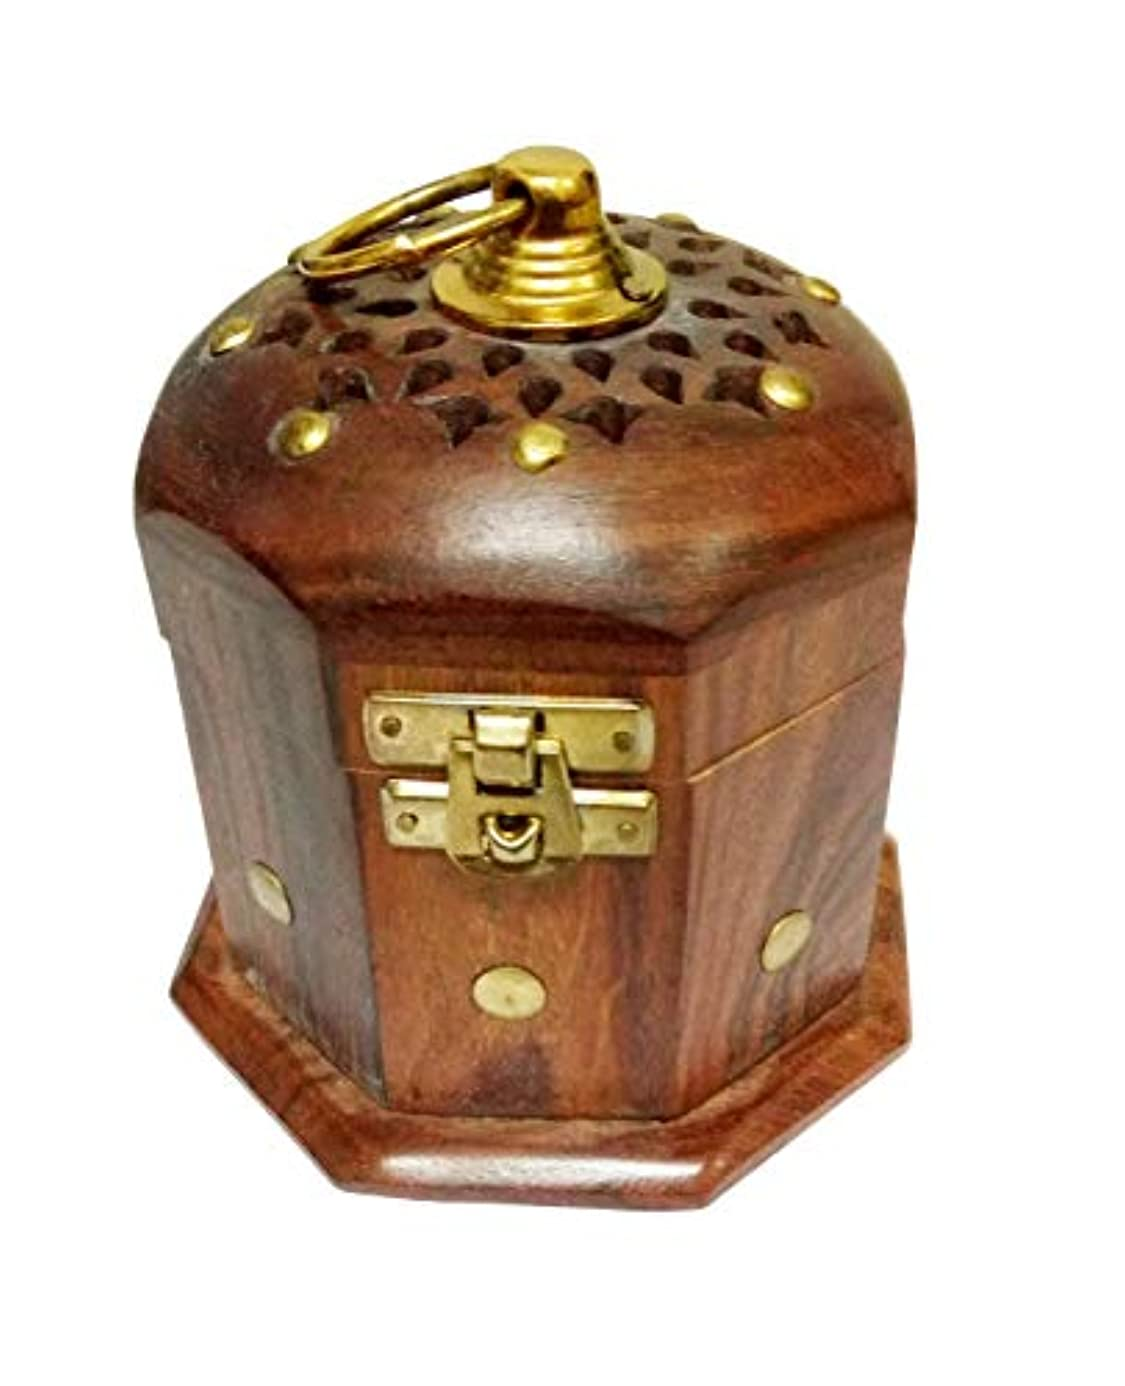 Sahishnu オンライン&マーケティング 木製クラシックムガール フープホルダー お香ホルダー